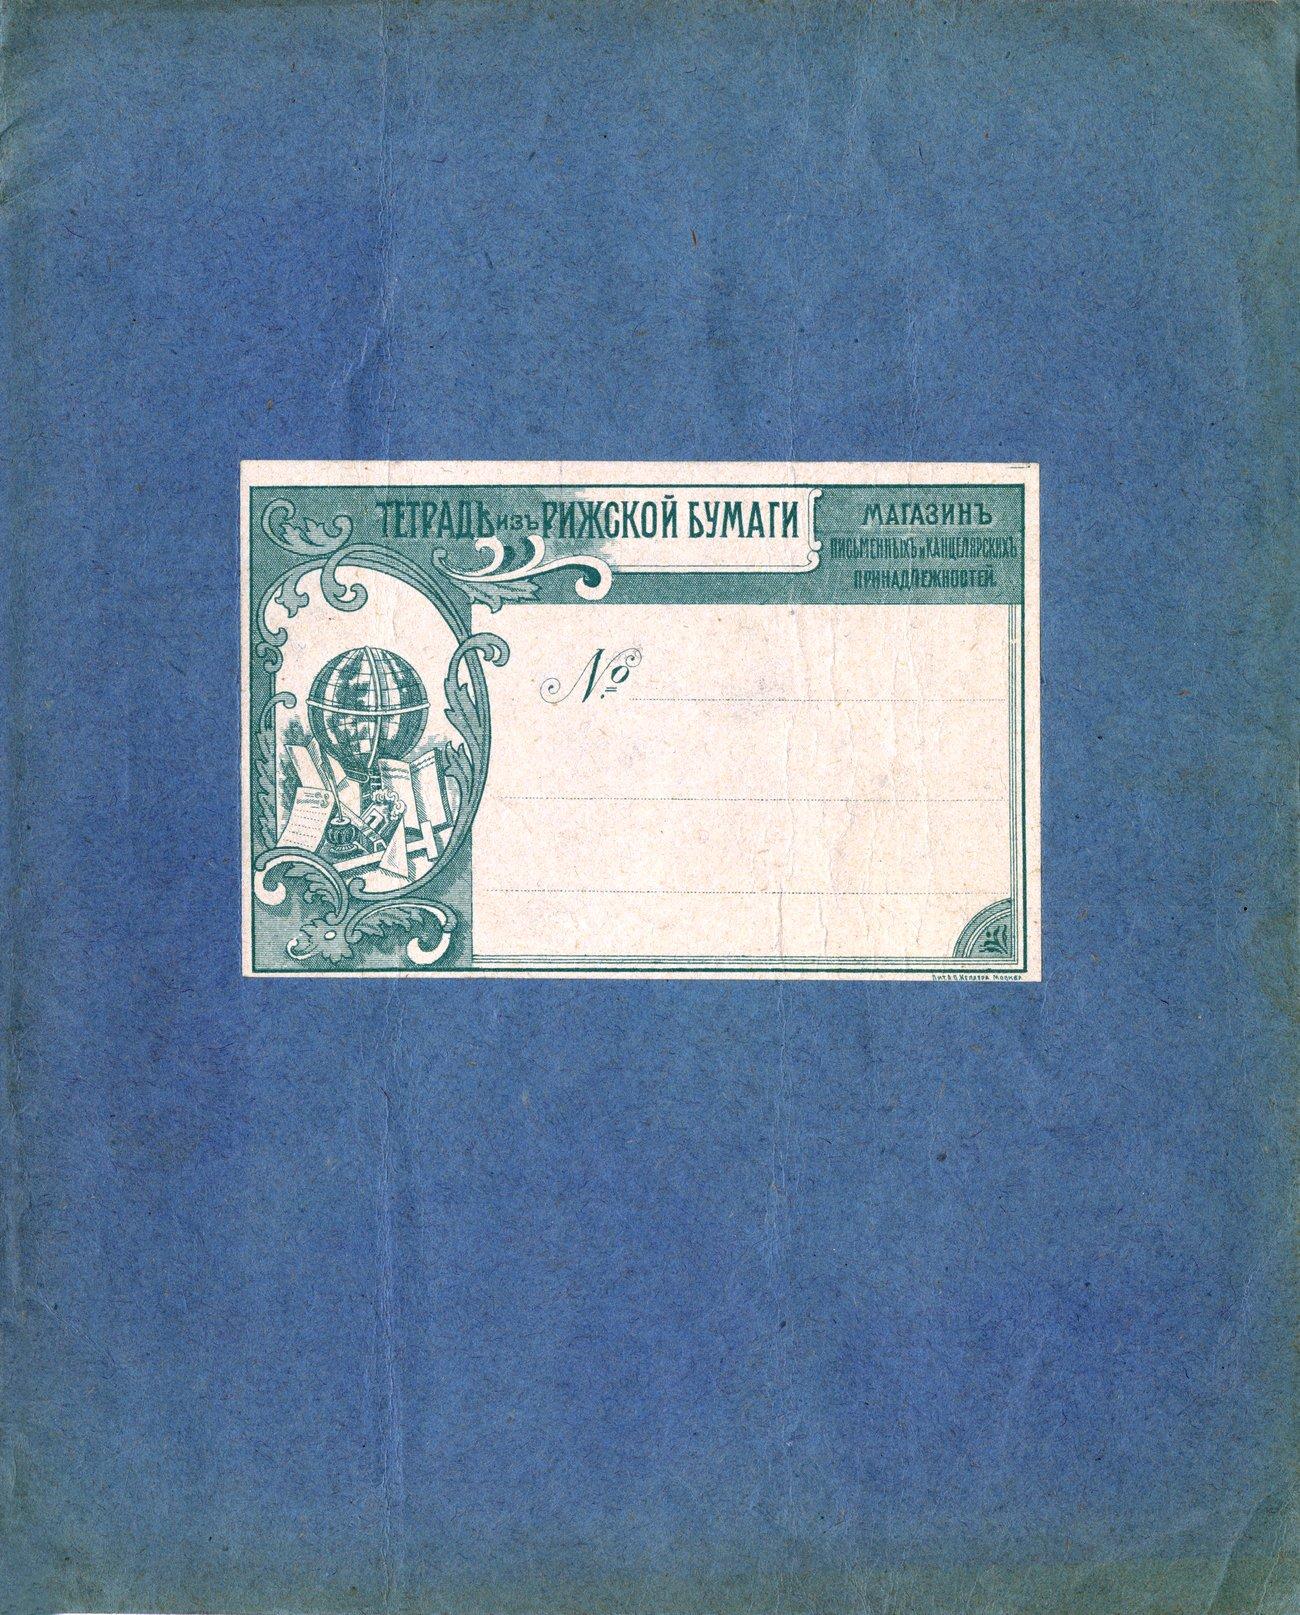 Тетрадь из Рижской бумаги, 180х220